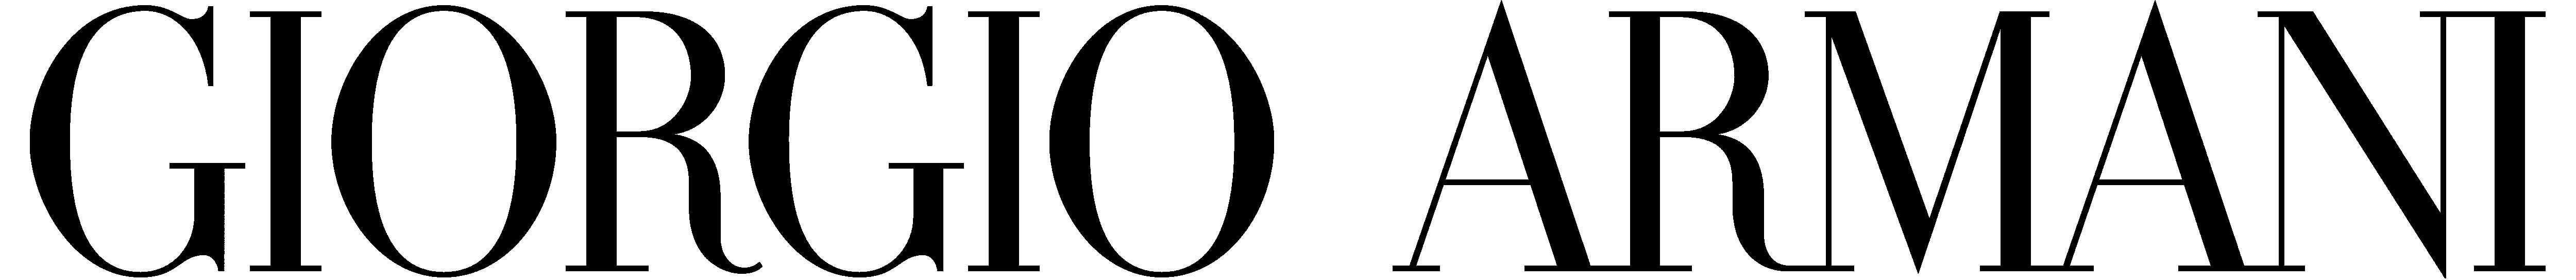 giorgio armani � logos download